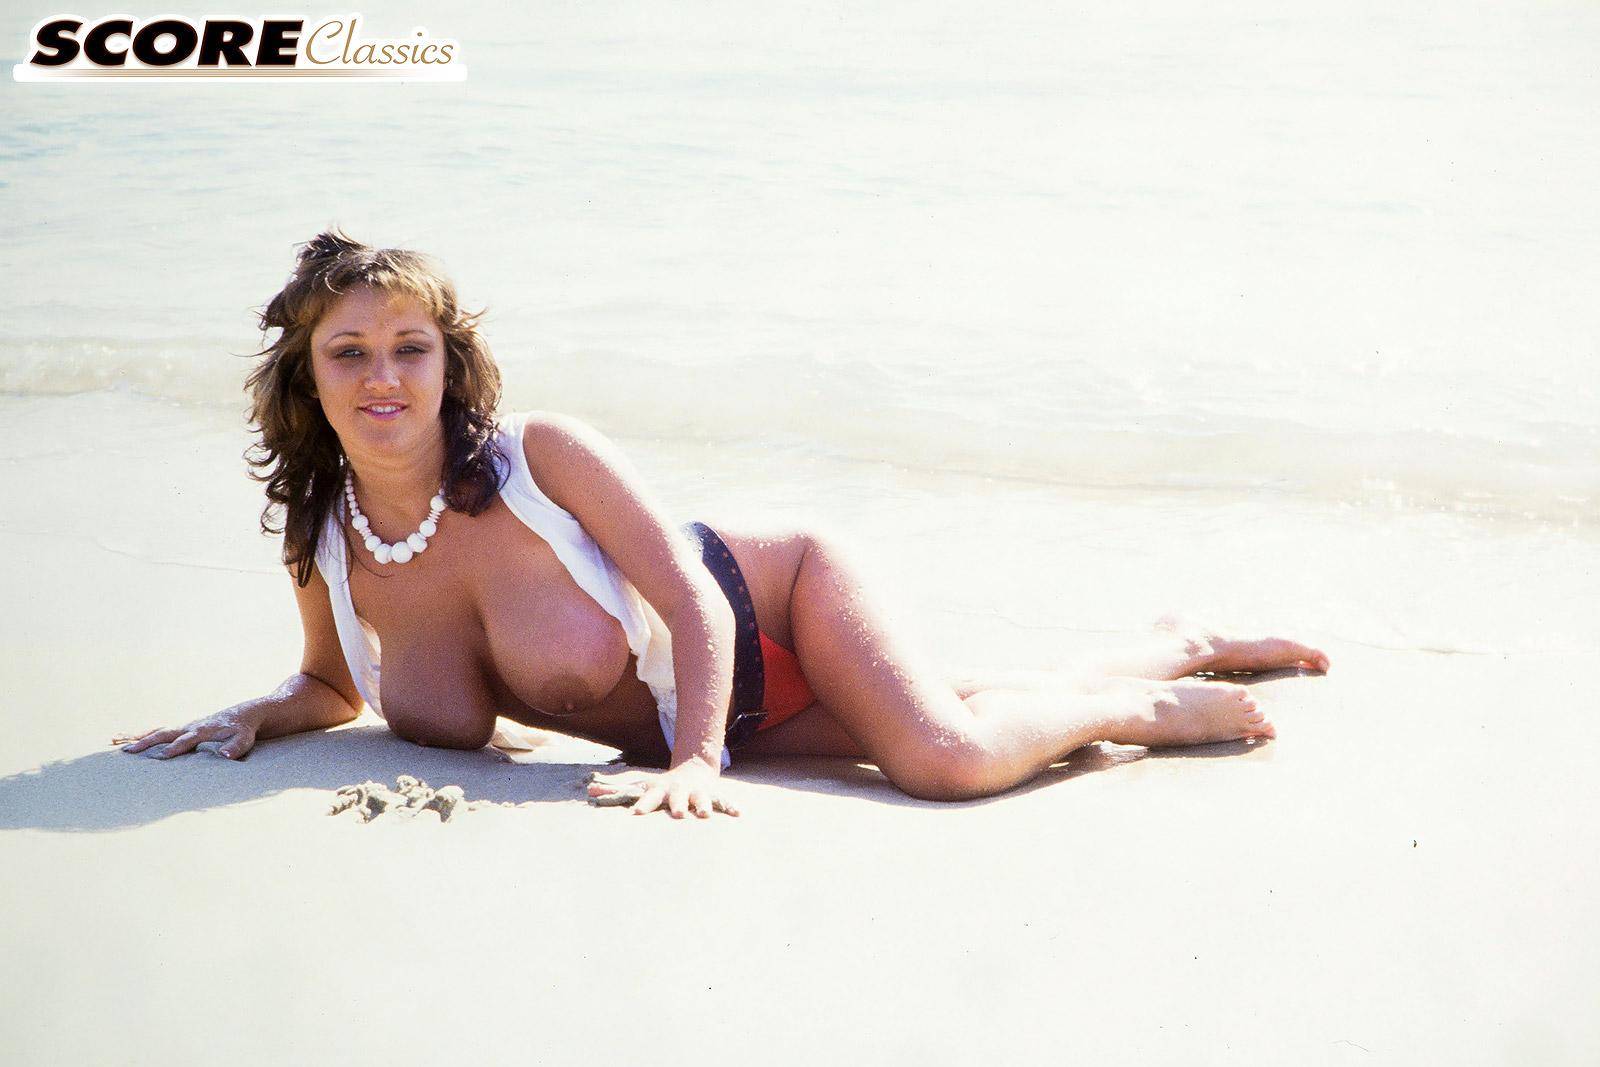 Score classics stacy owen patti lingerie boob xxxx sex hd pics